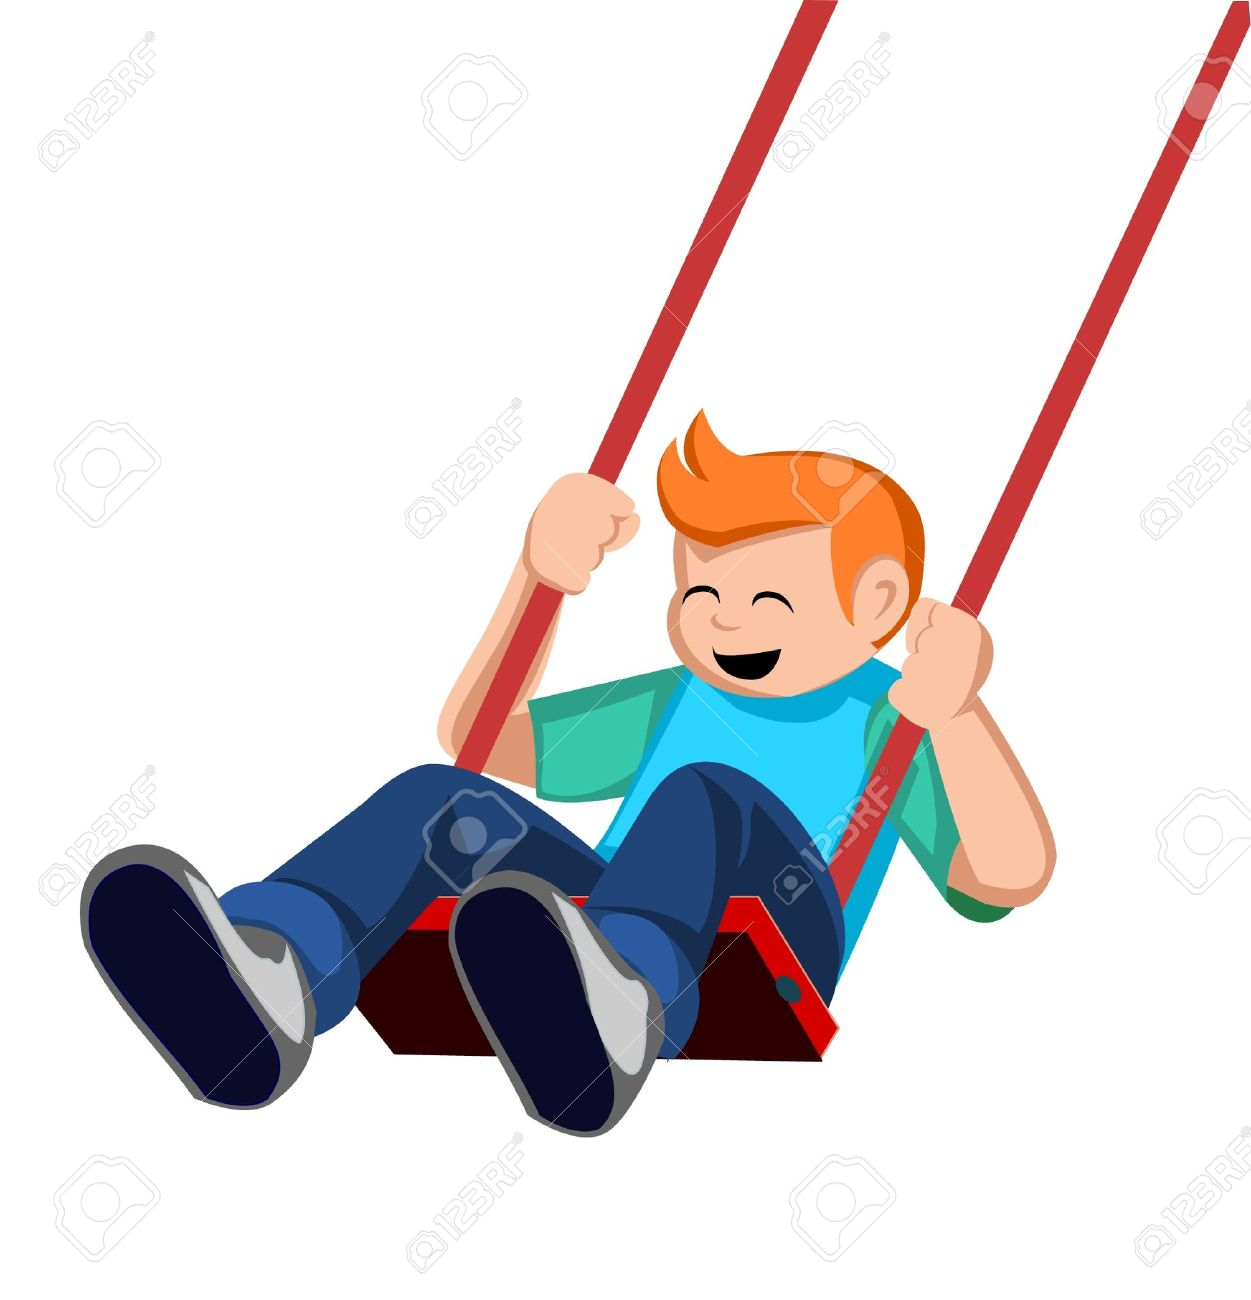 1251x1300 Swing Cartoon Stock Photos. Royalty Free Swing Cartoon Images